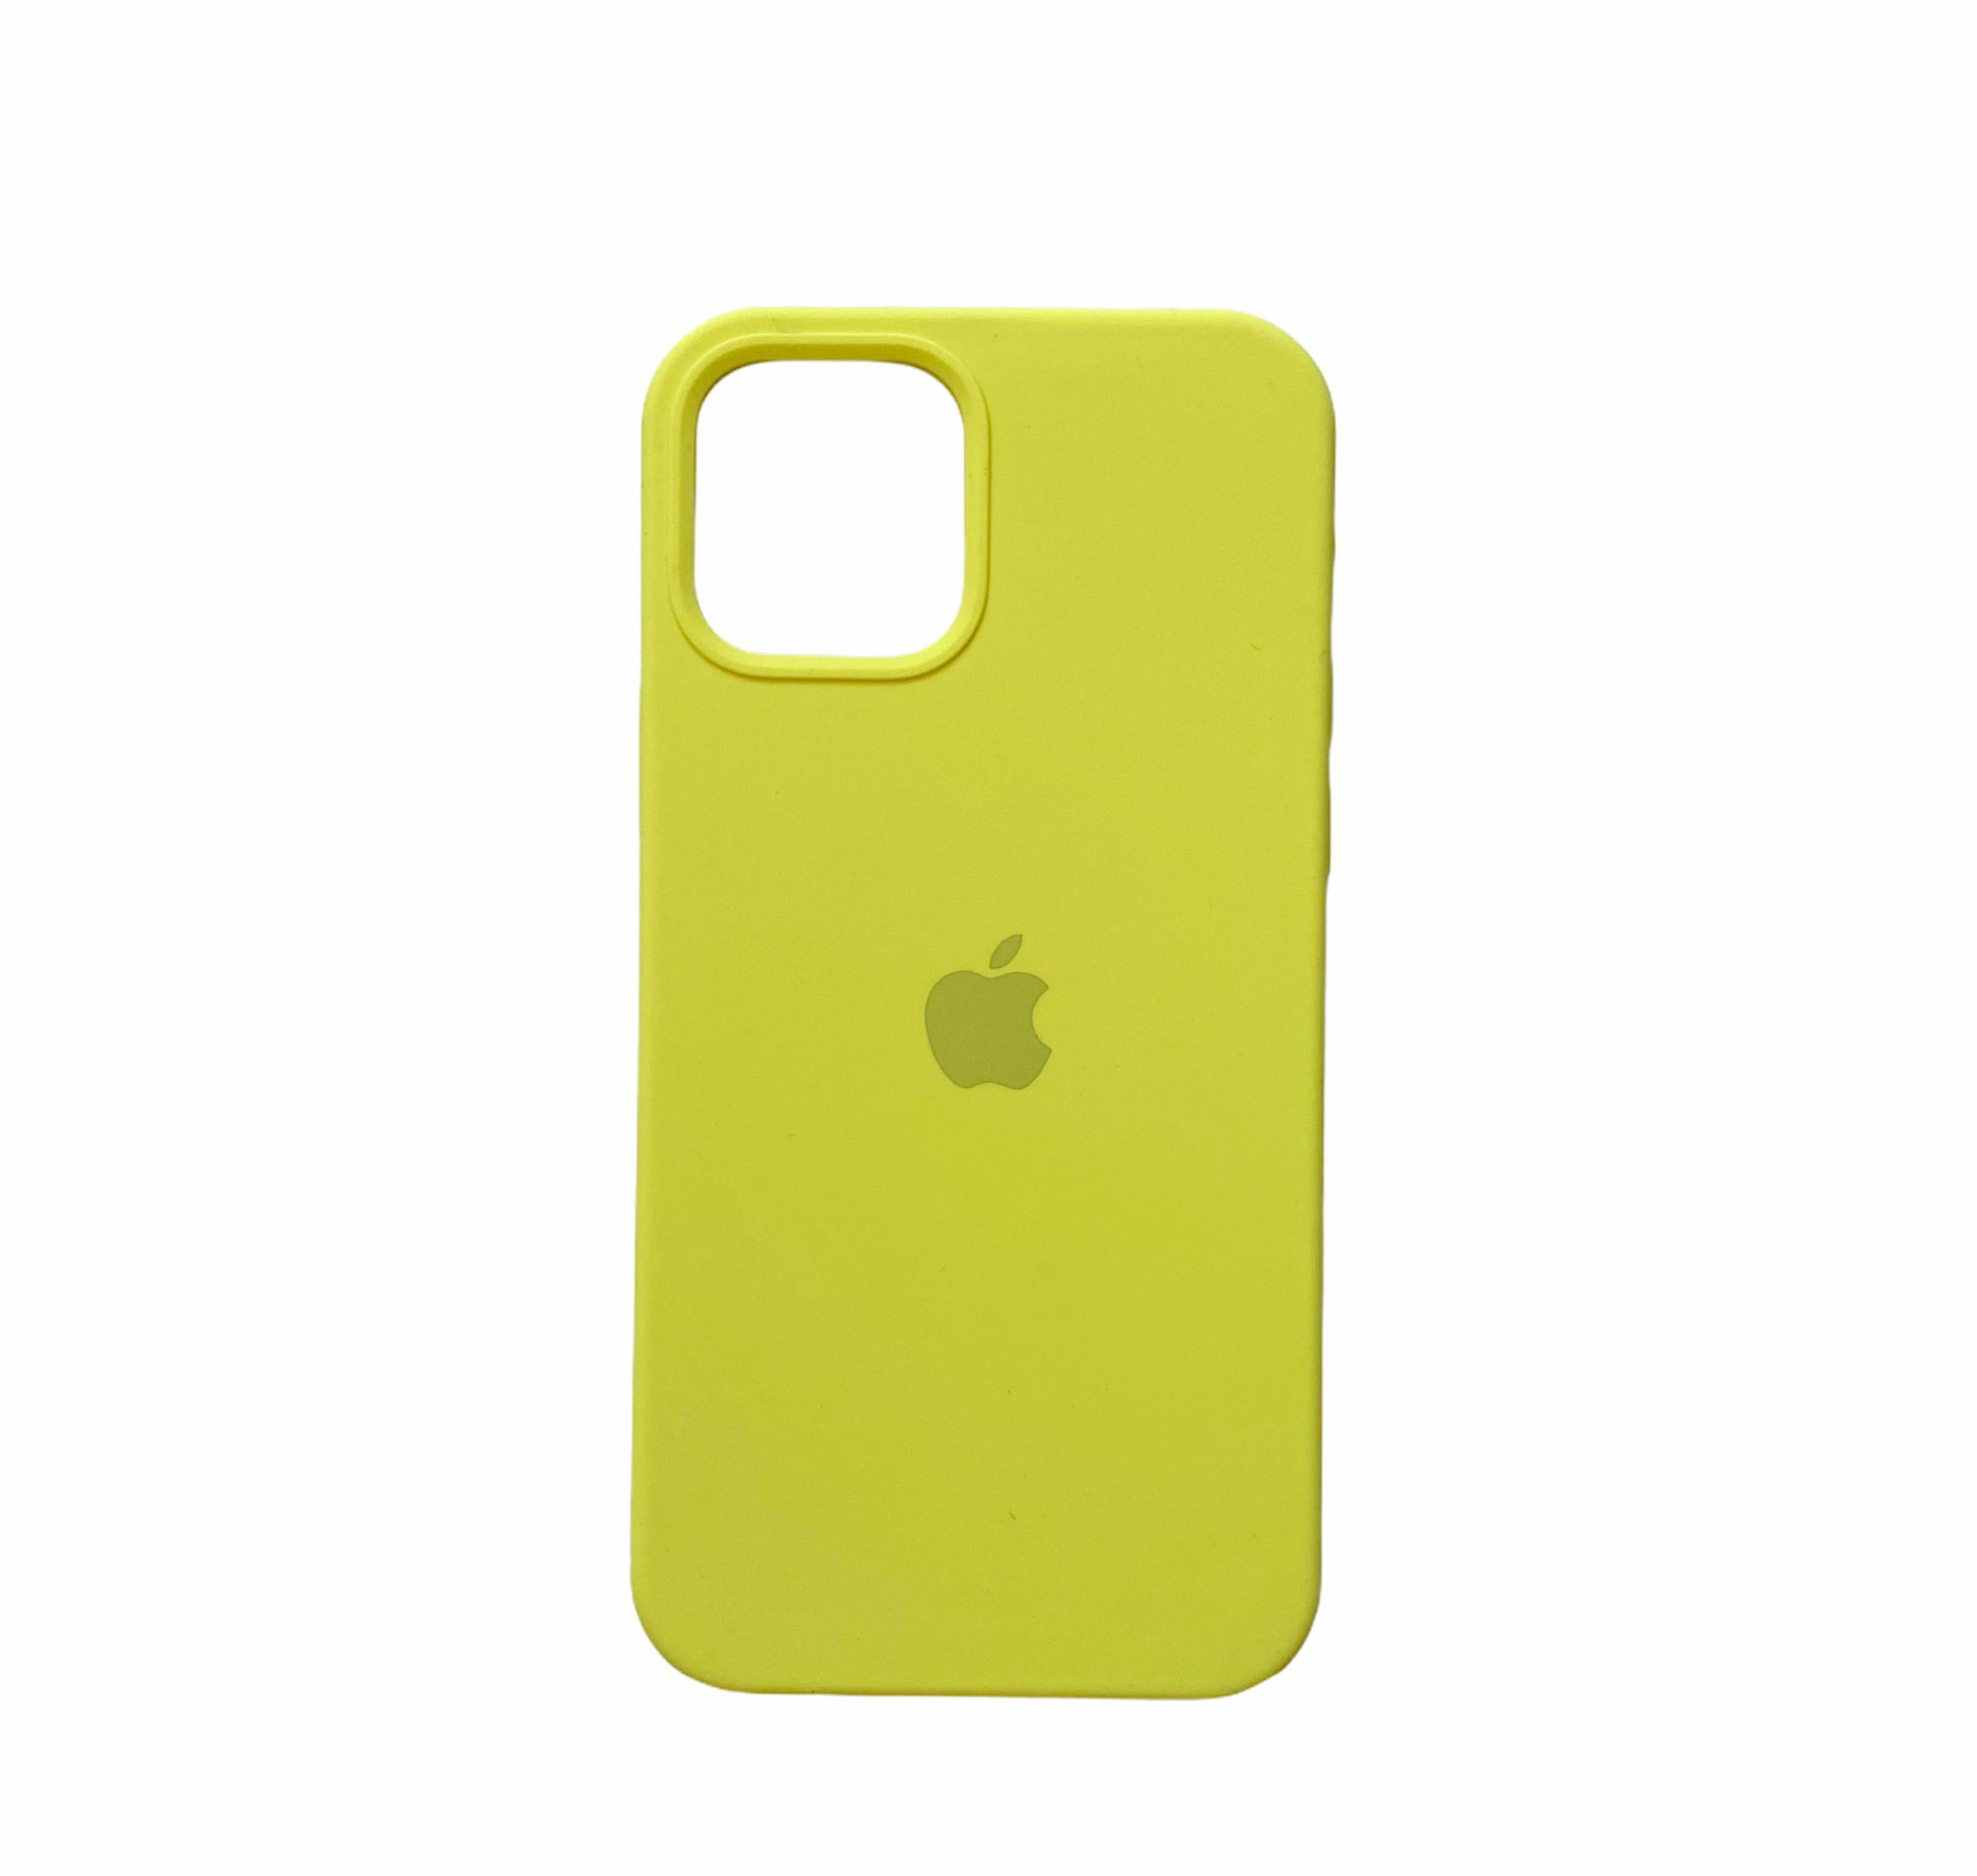 "Carcasas iPhone 12 / 12 Pro (6.1"")"